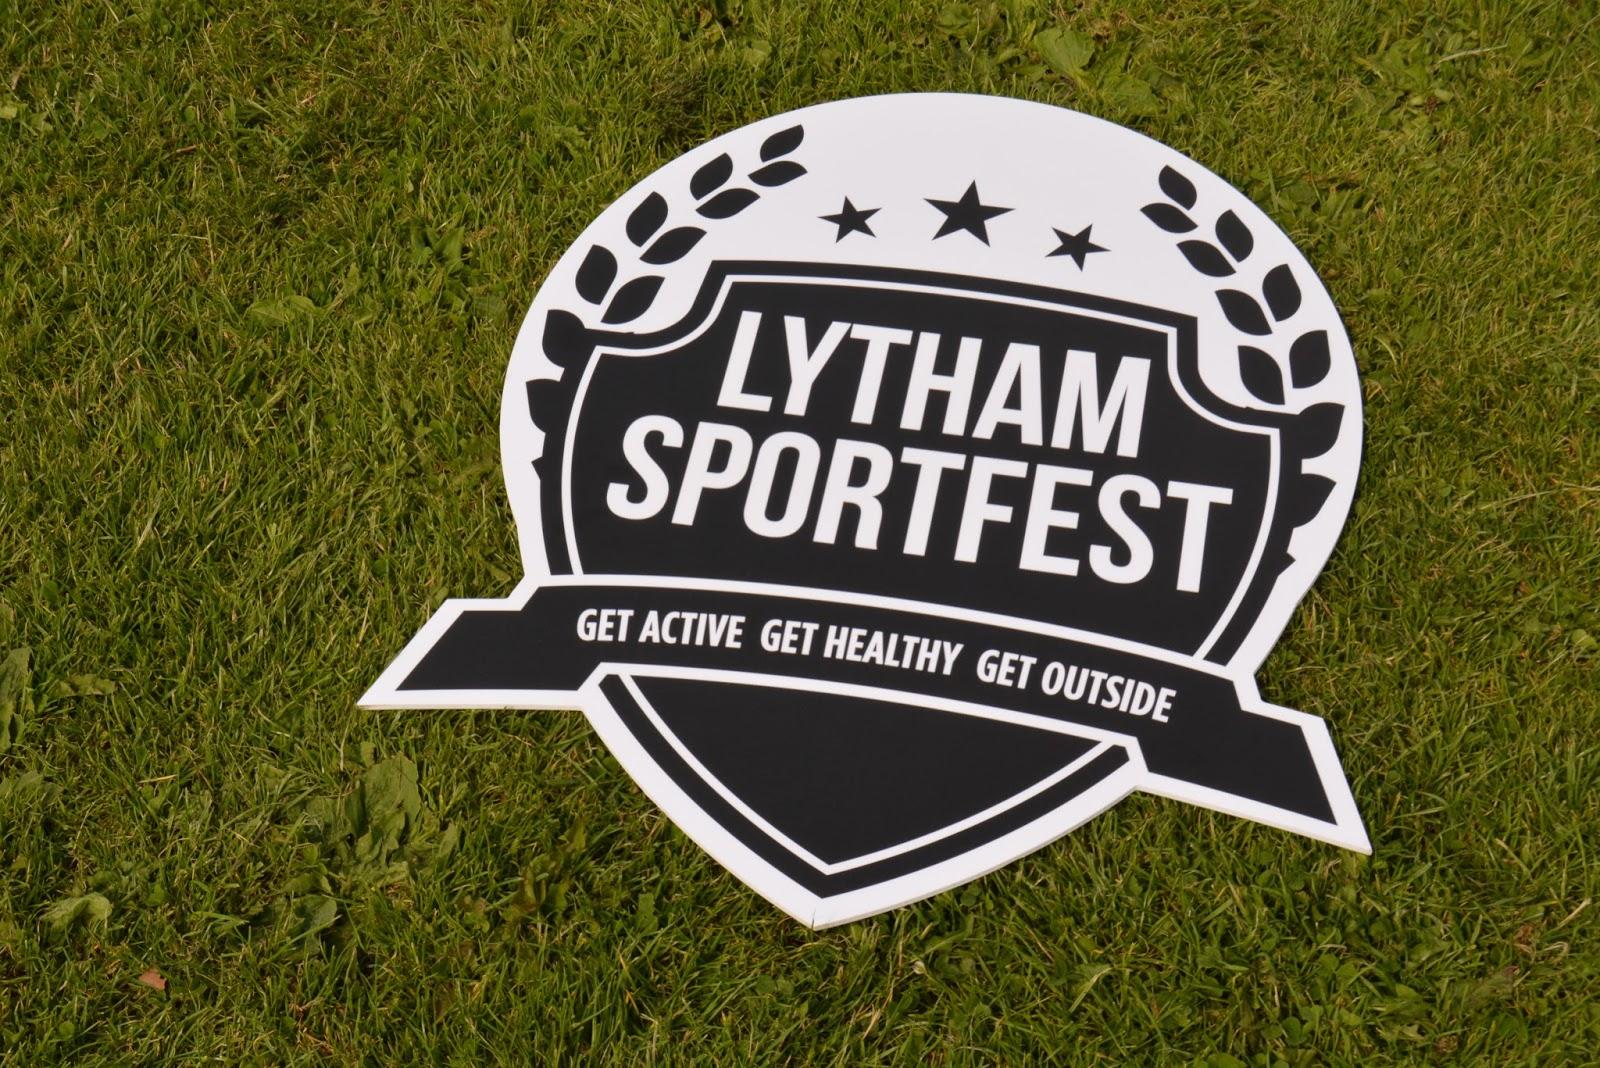 lytham, sports, rio 2016, olympics, paralympics, event, iamteamgb, team gb,